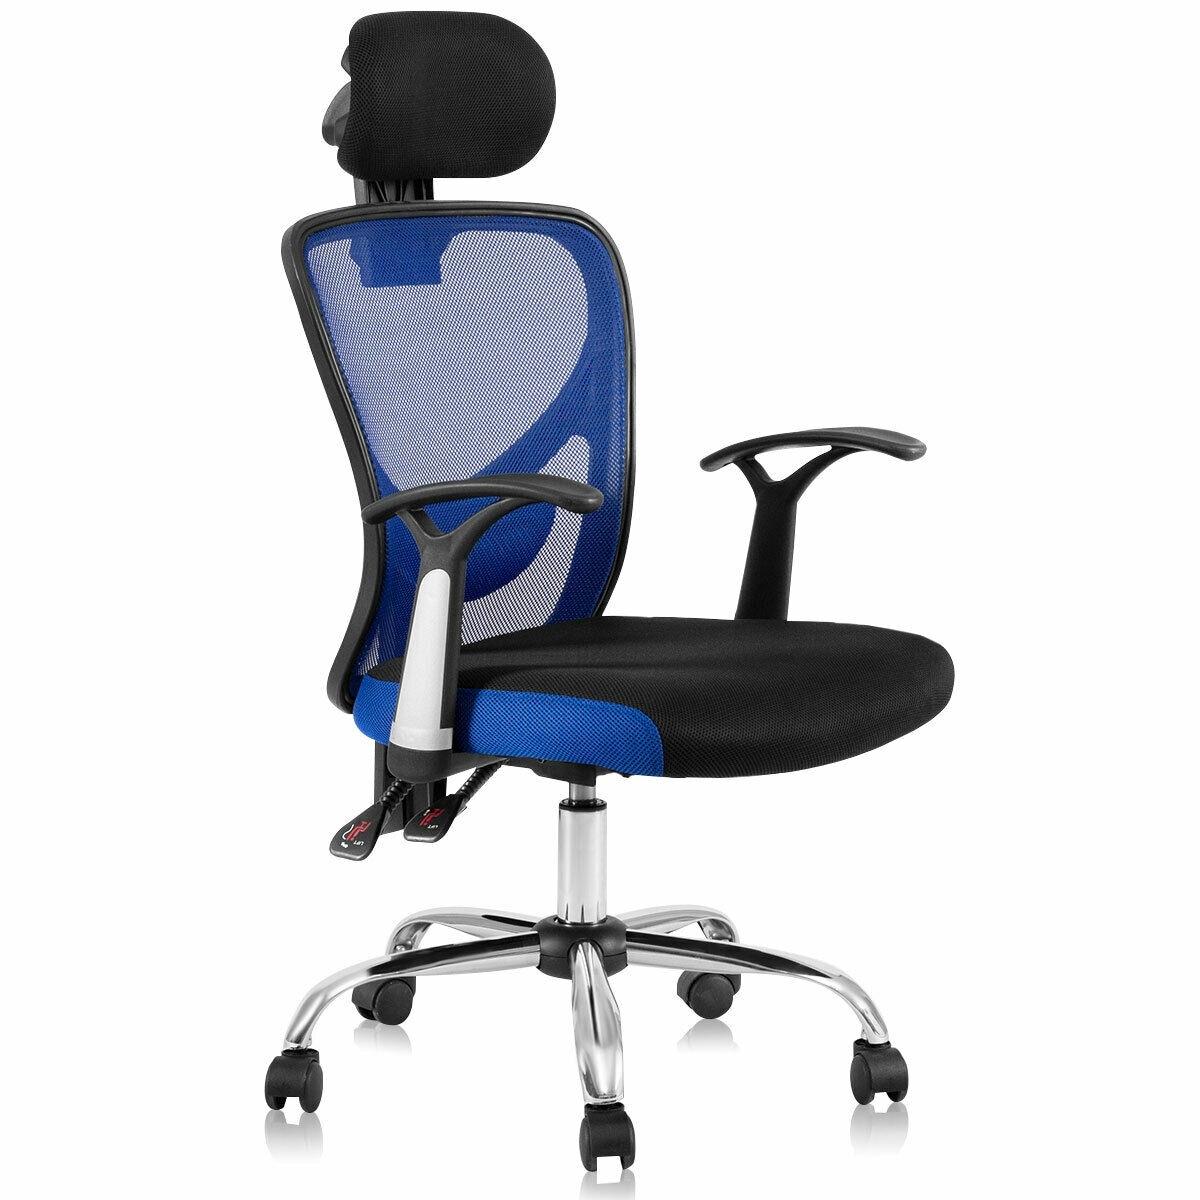 Costway Ergonomic Mesh High Back Office Chair Headrest Blue  sc 1 st  Overstock.com & Shop Costway Ergonomic Mesh High Back Office Chair Headrest Blue ...